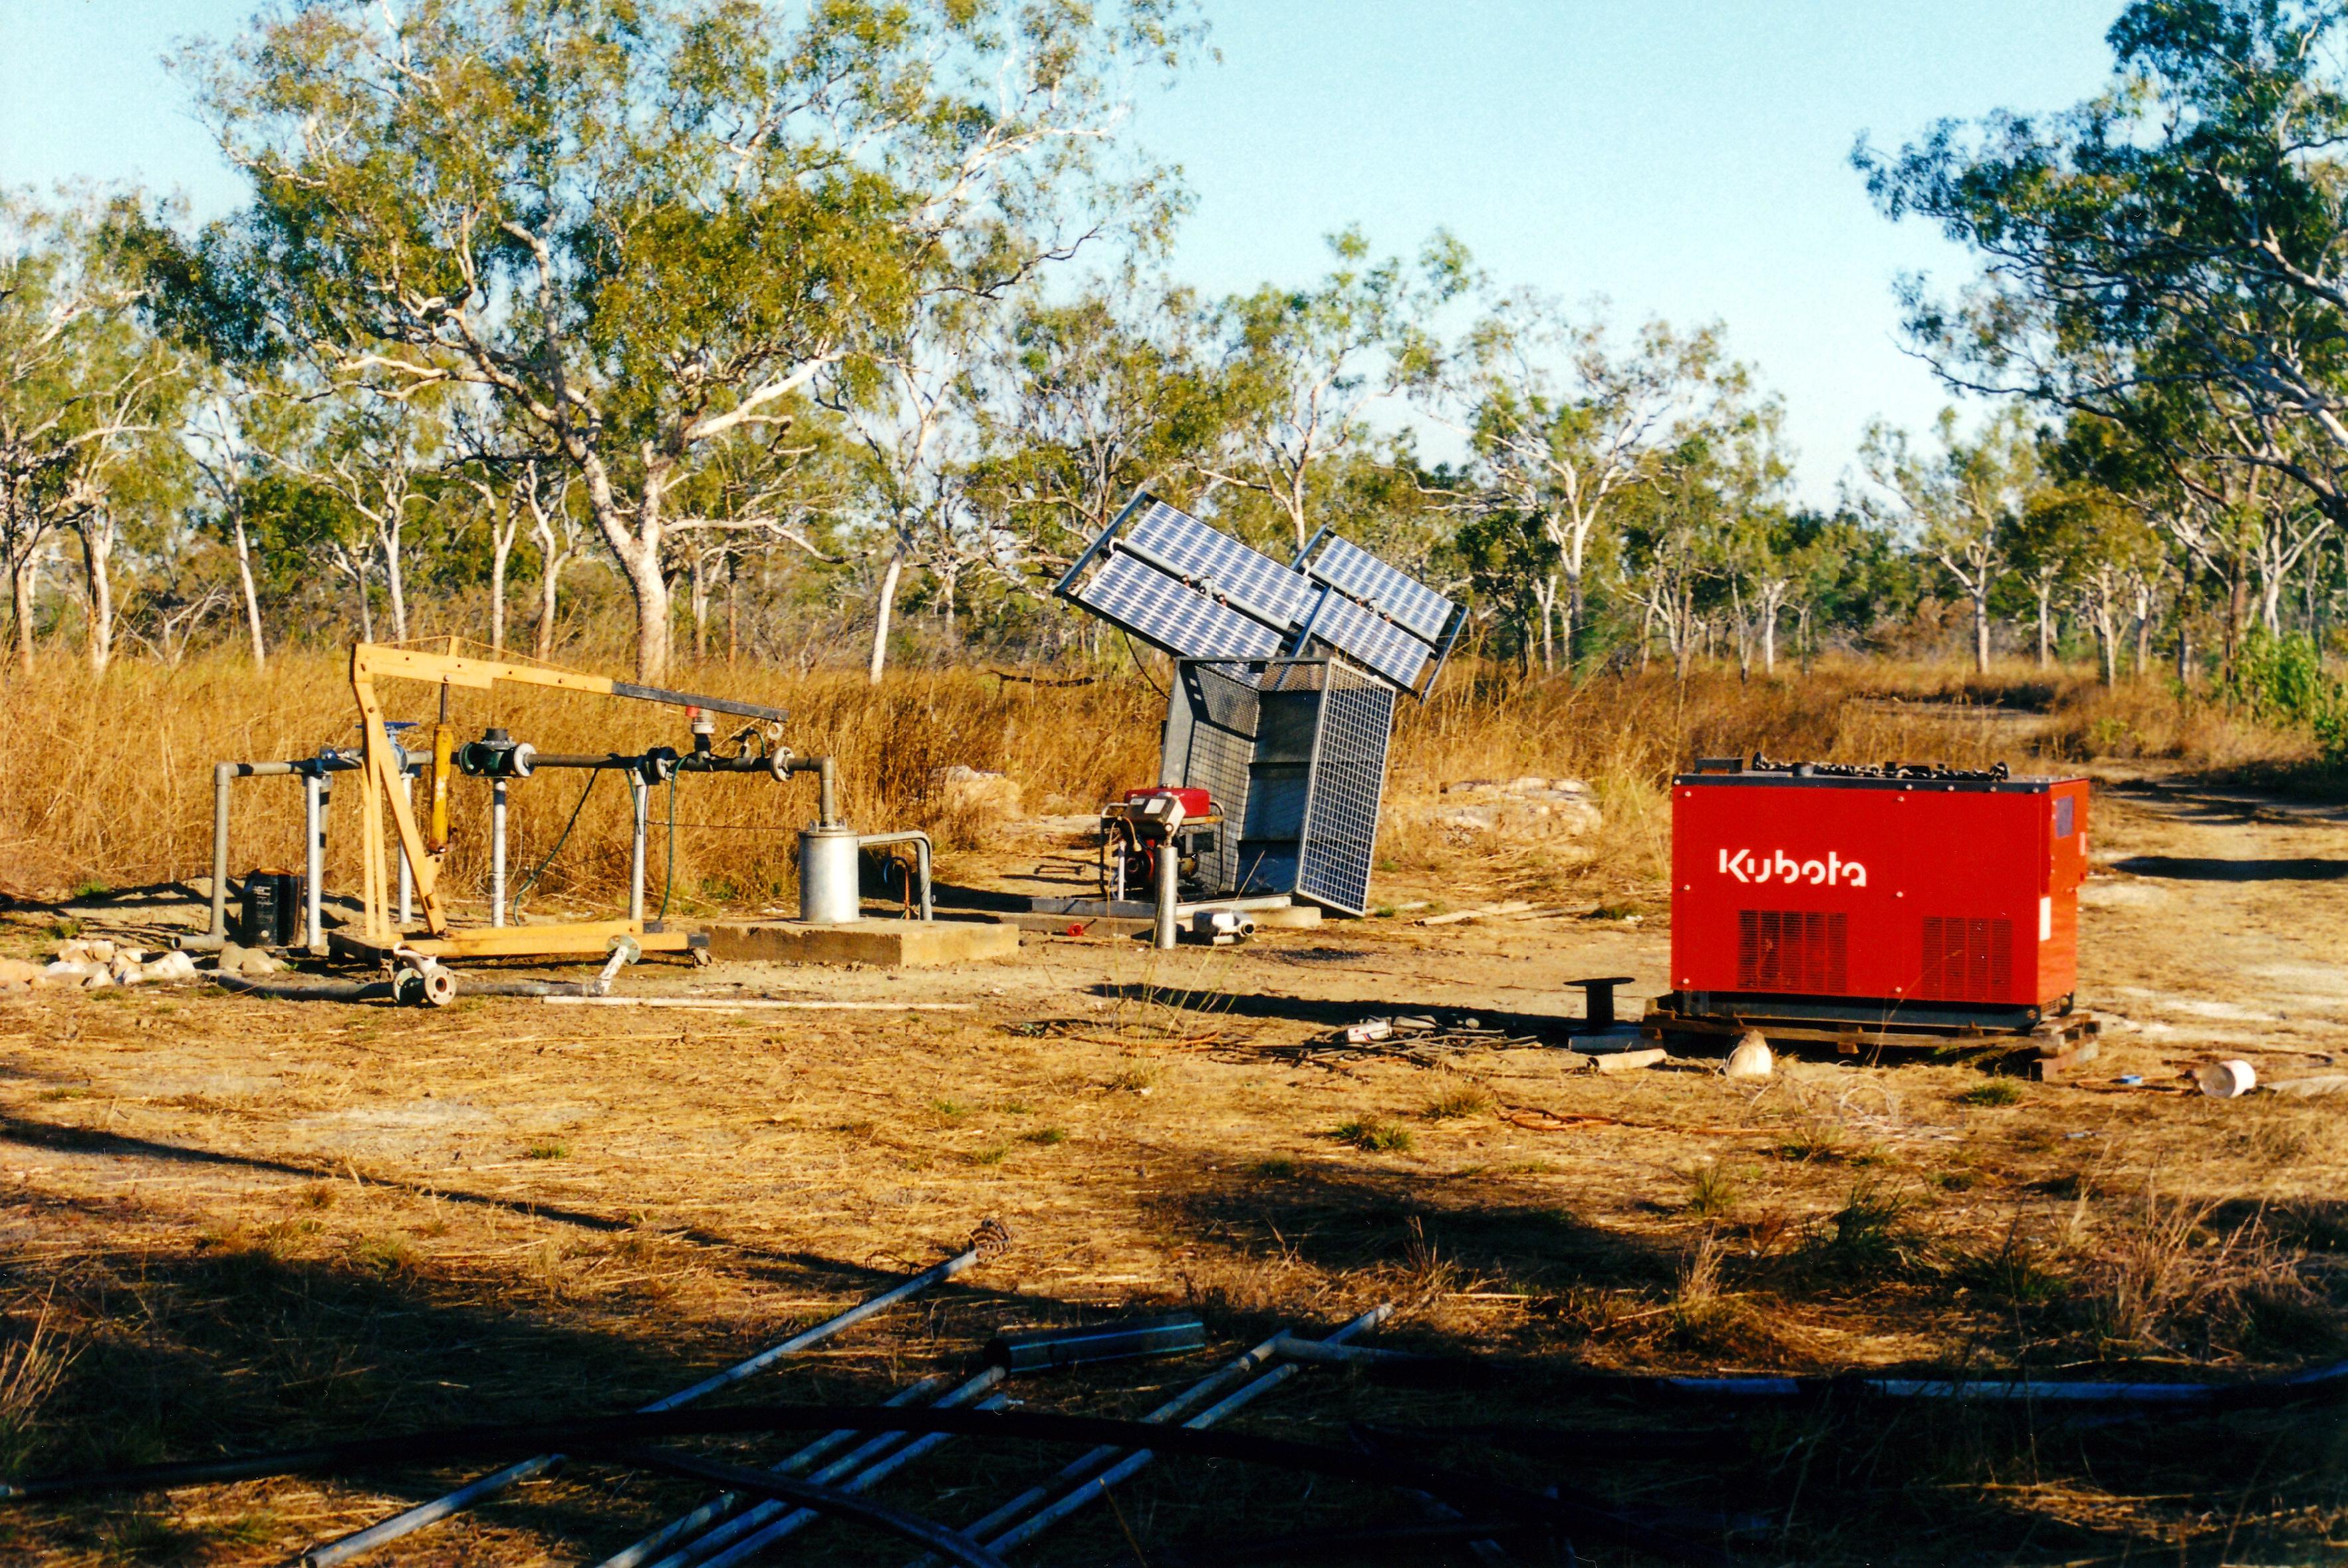 08-04-2000 solar powered pump and genset.jpg